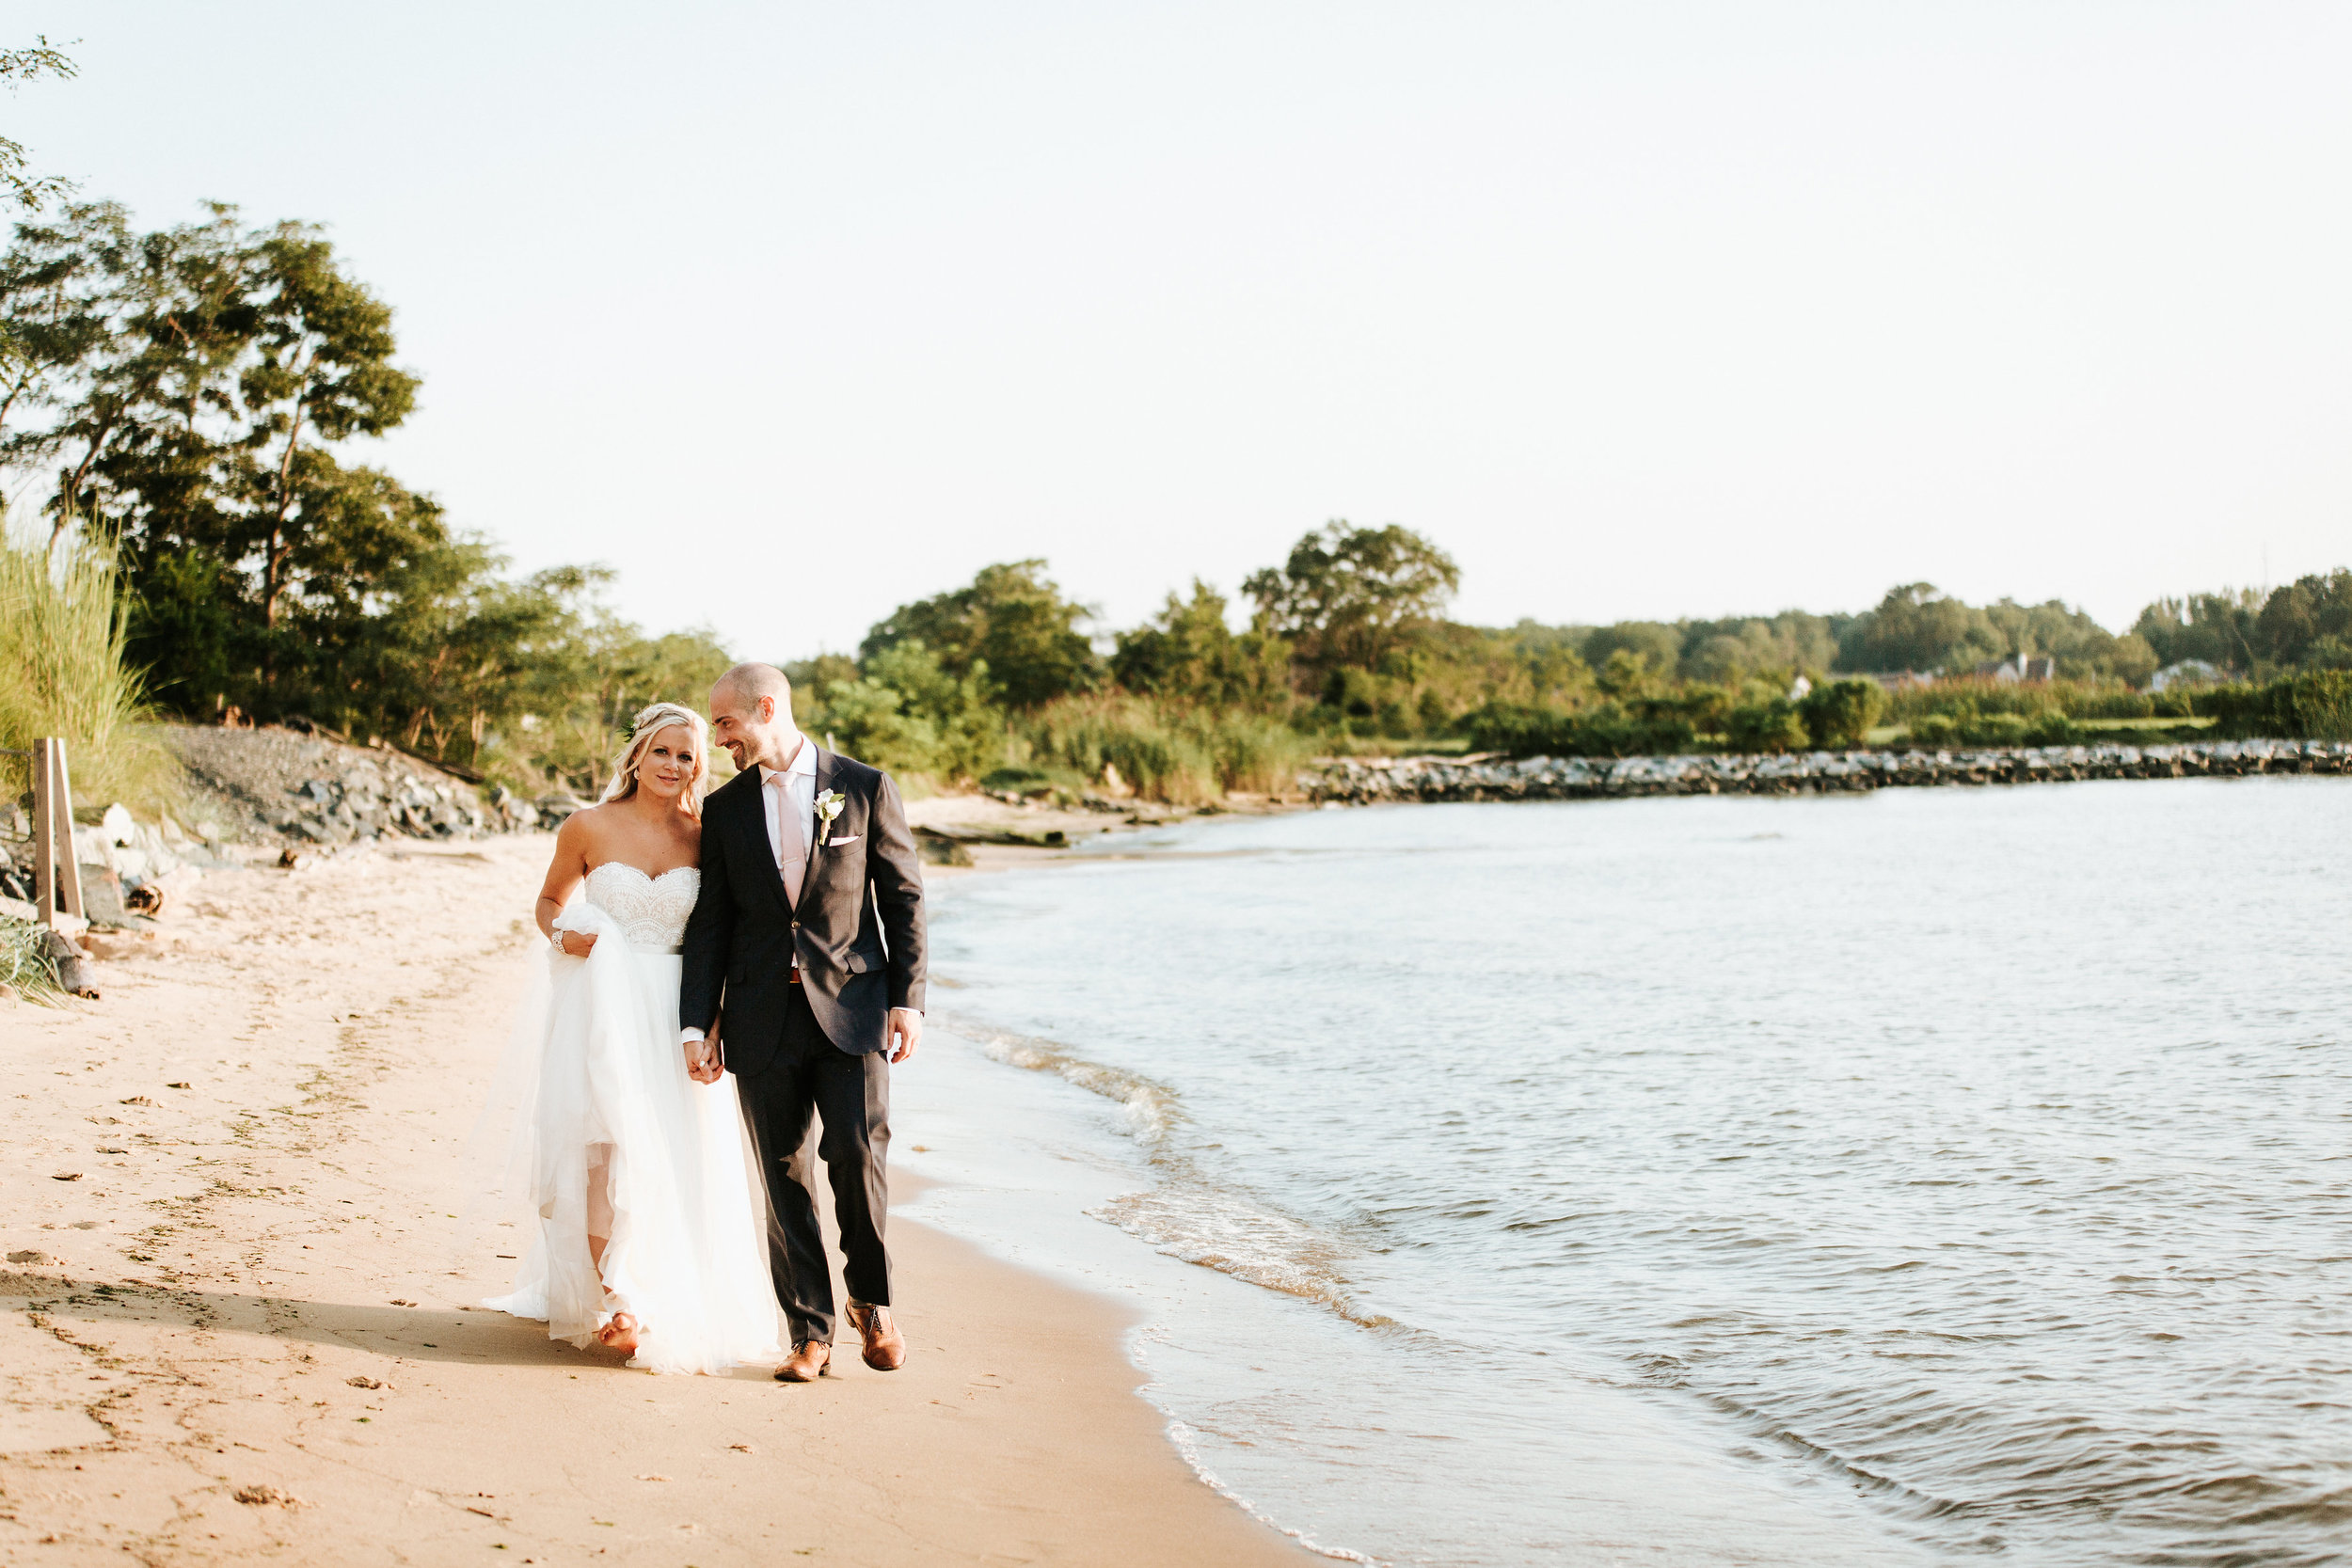 Marryland Weddings_Chesapeake Bay Beach Club_Allison and Aaron